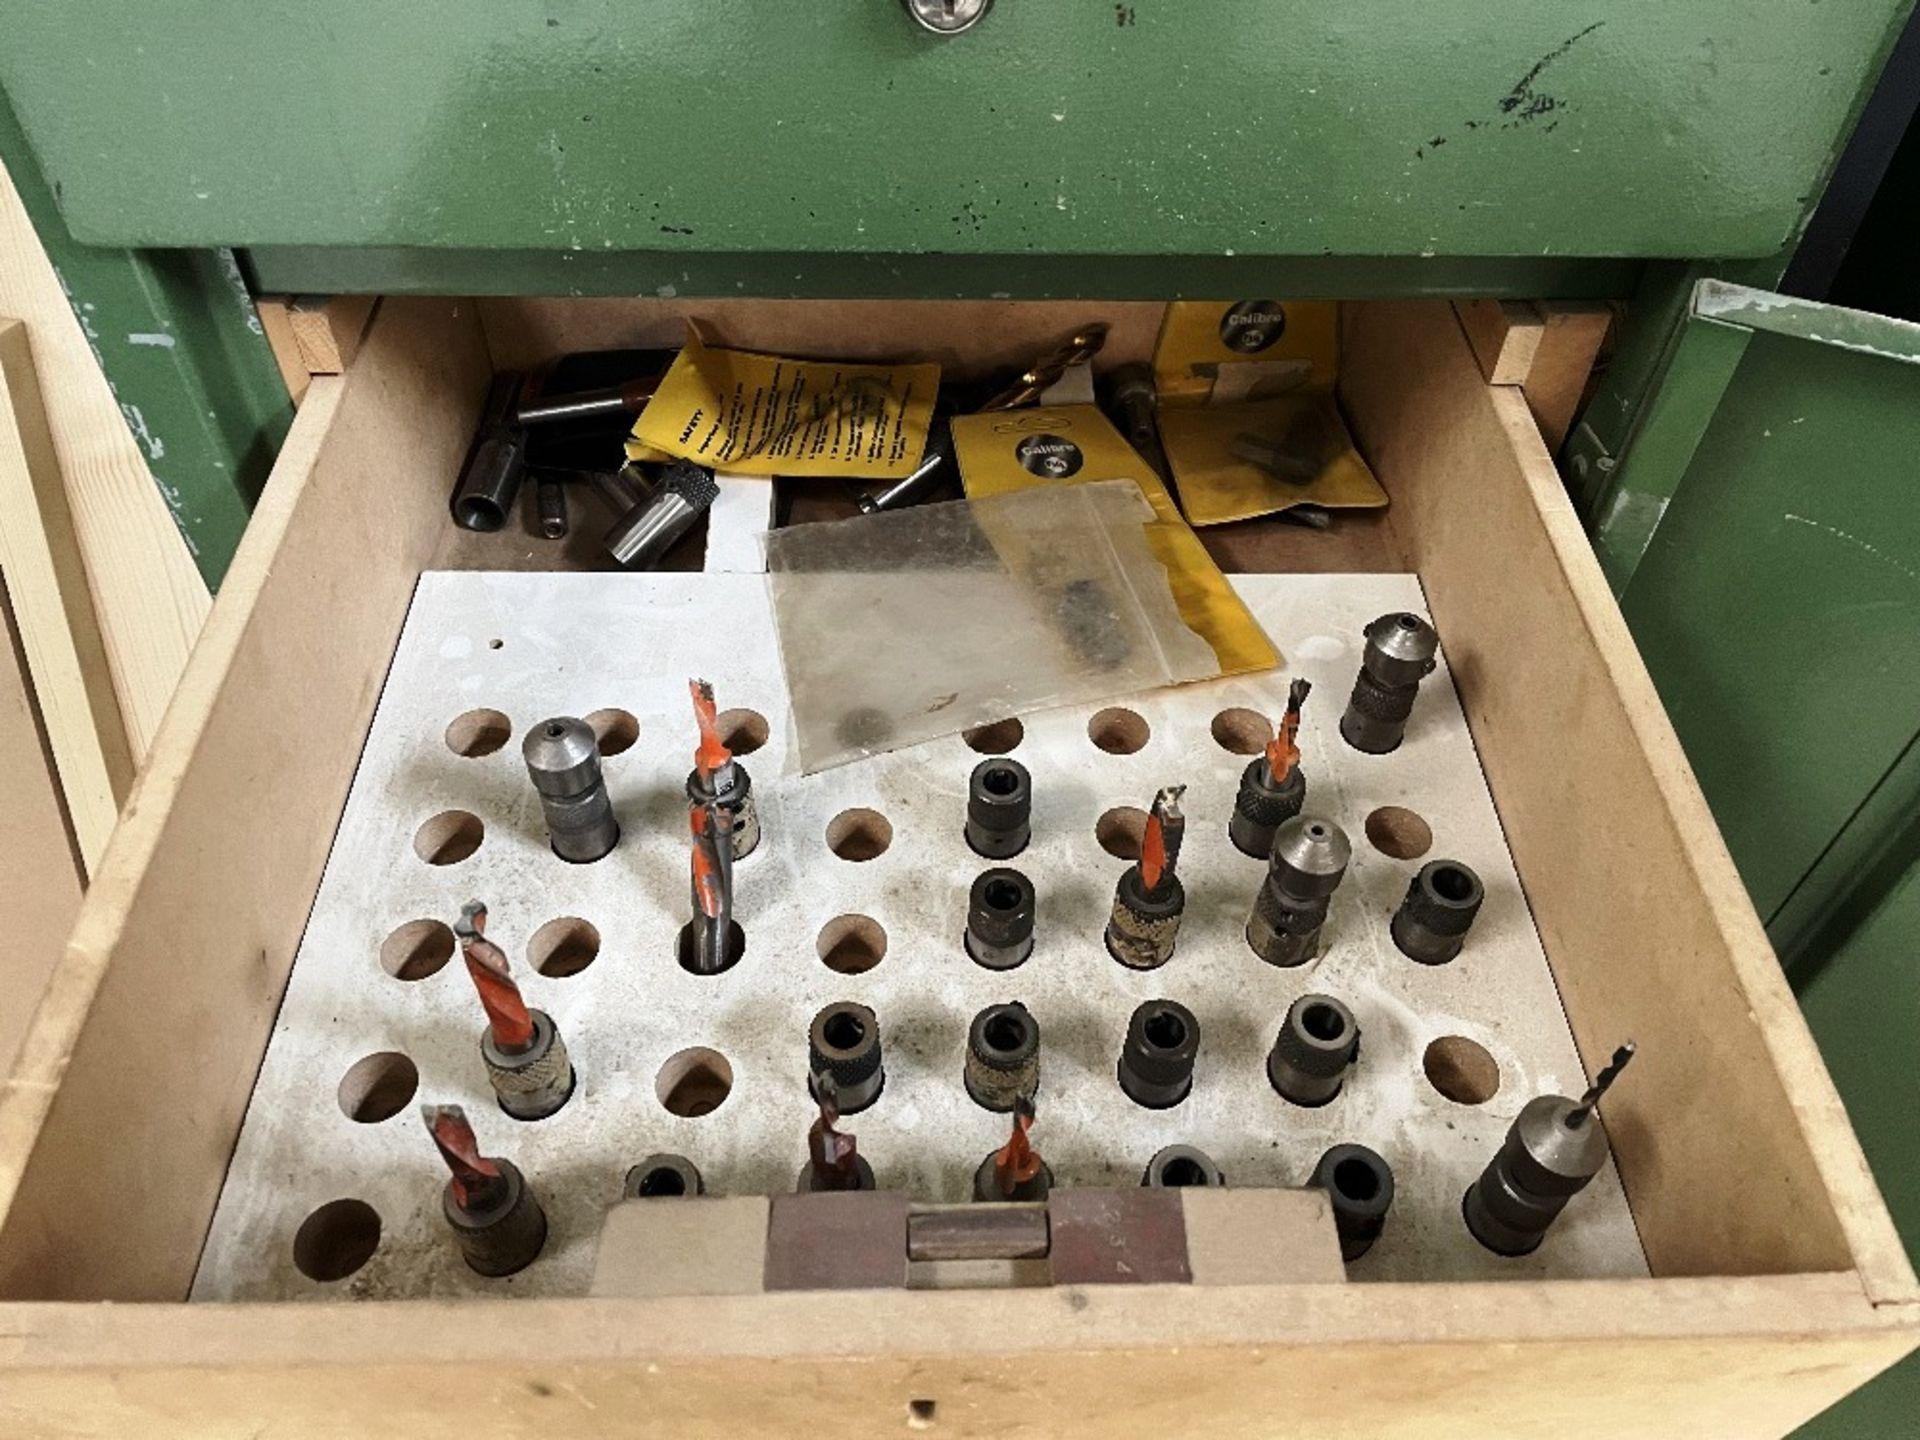 Maggi 3532 4 Head Boring Machine w/ Tool Cabinet & Tooling | YOM: 1999 - Image 10 of 12